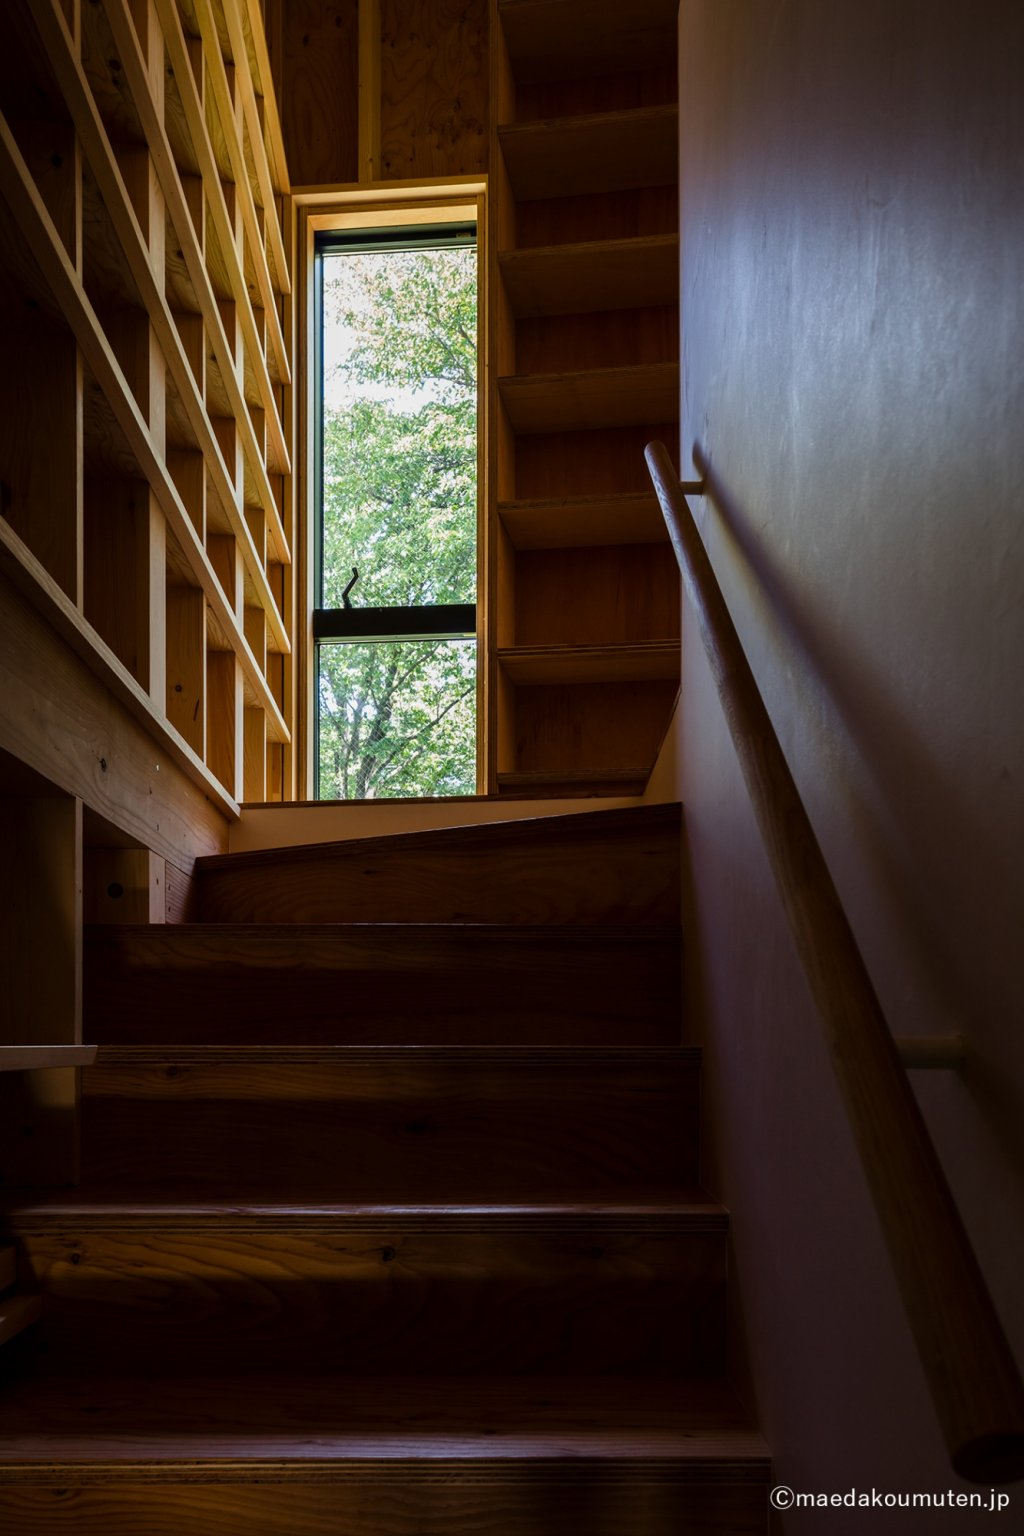 神奈川、工務店、注文住宅、デザイン住宅、建築家、亀井野の家、16